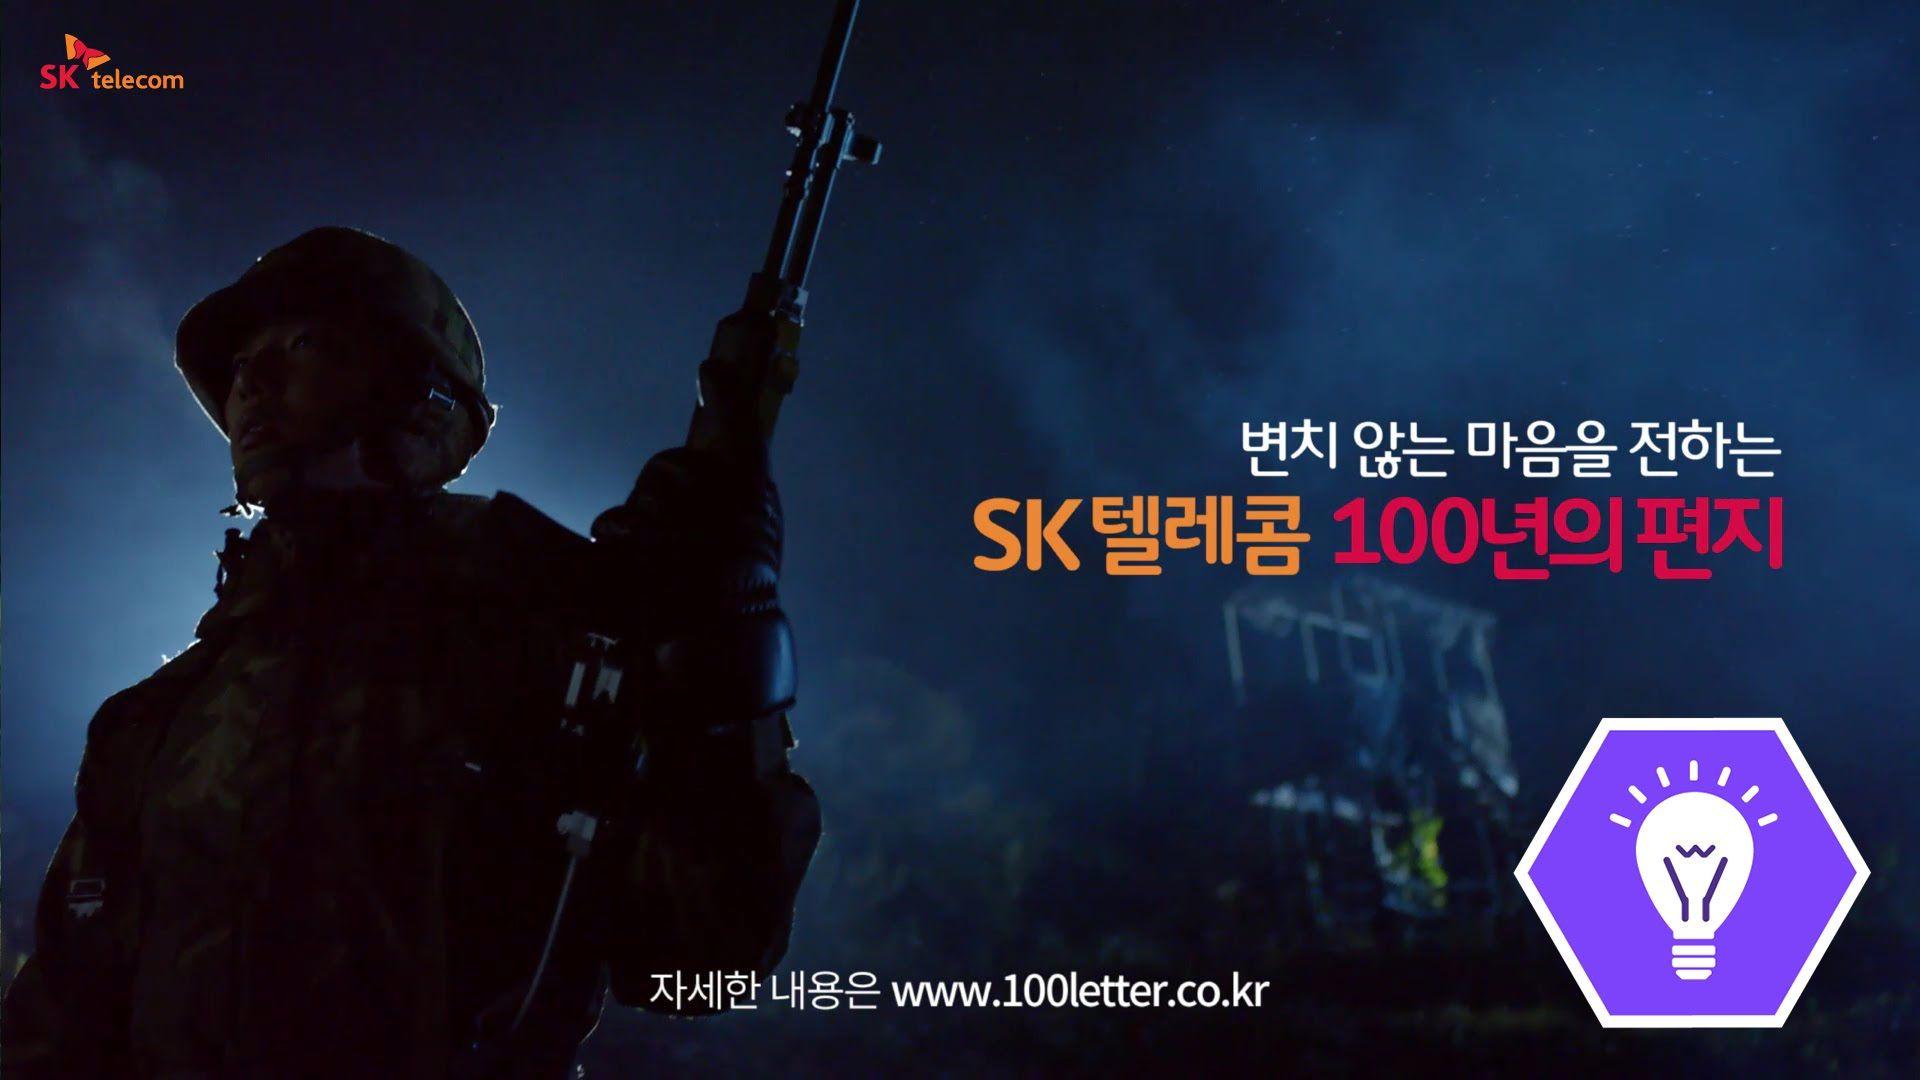 [SK텔레콤] 100년의 편지 - 군대 편